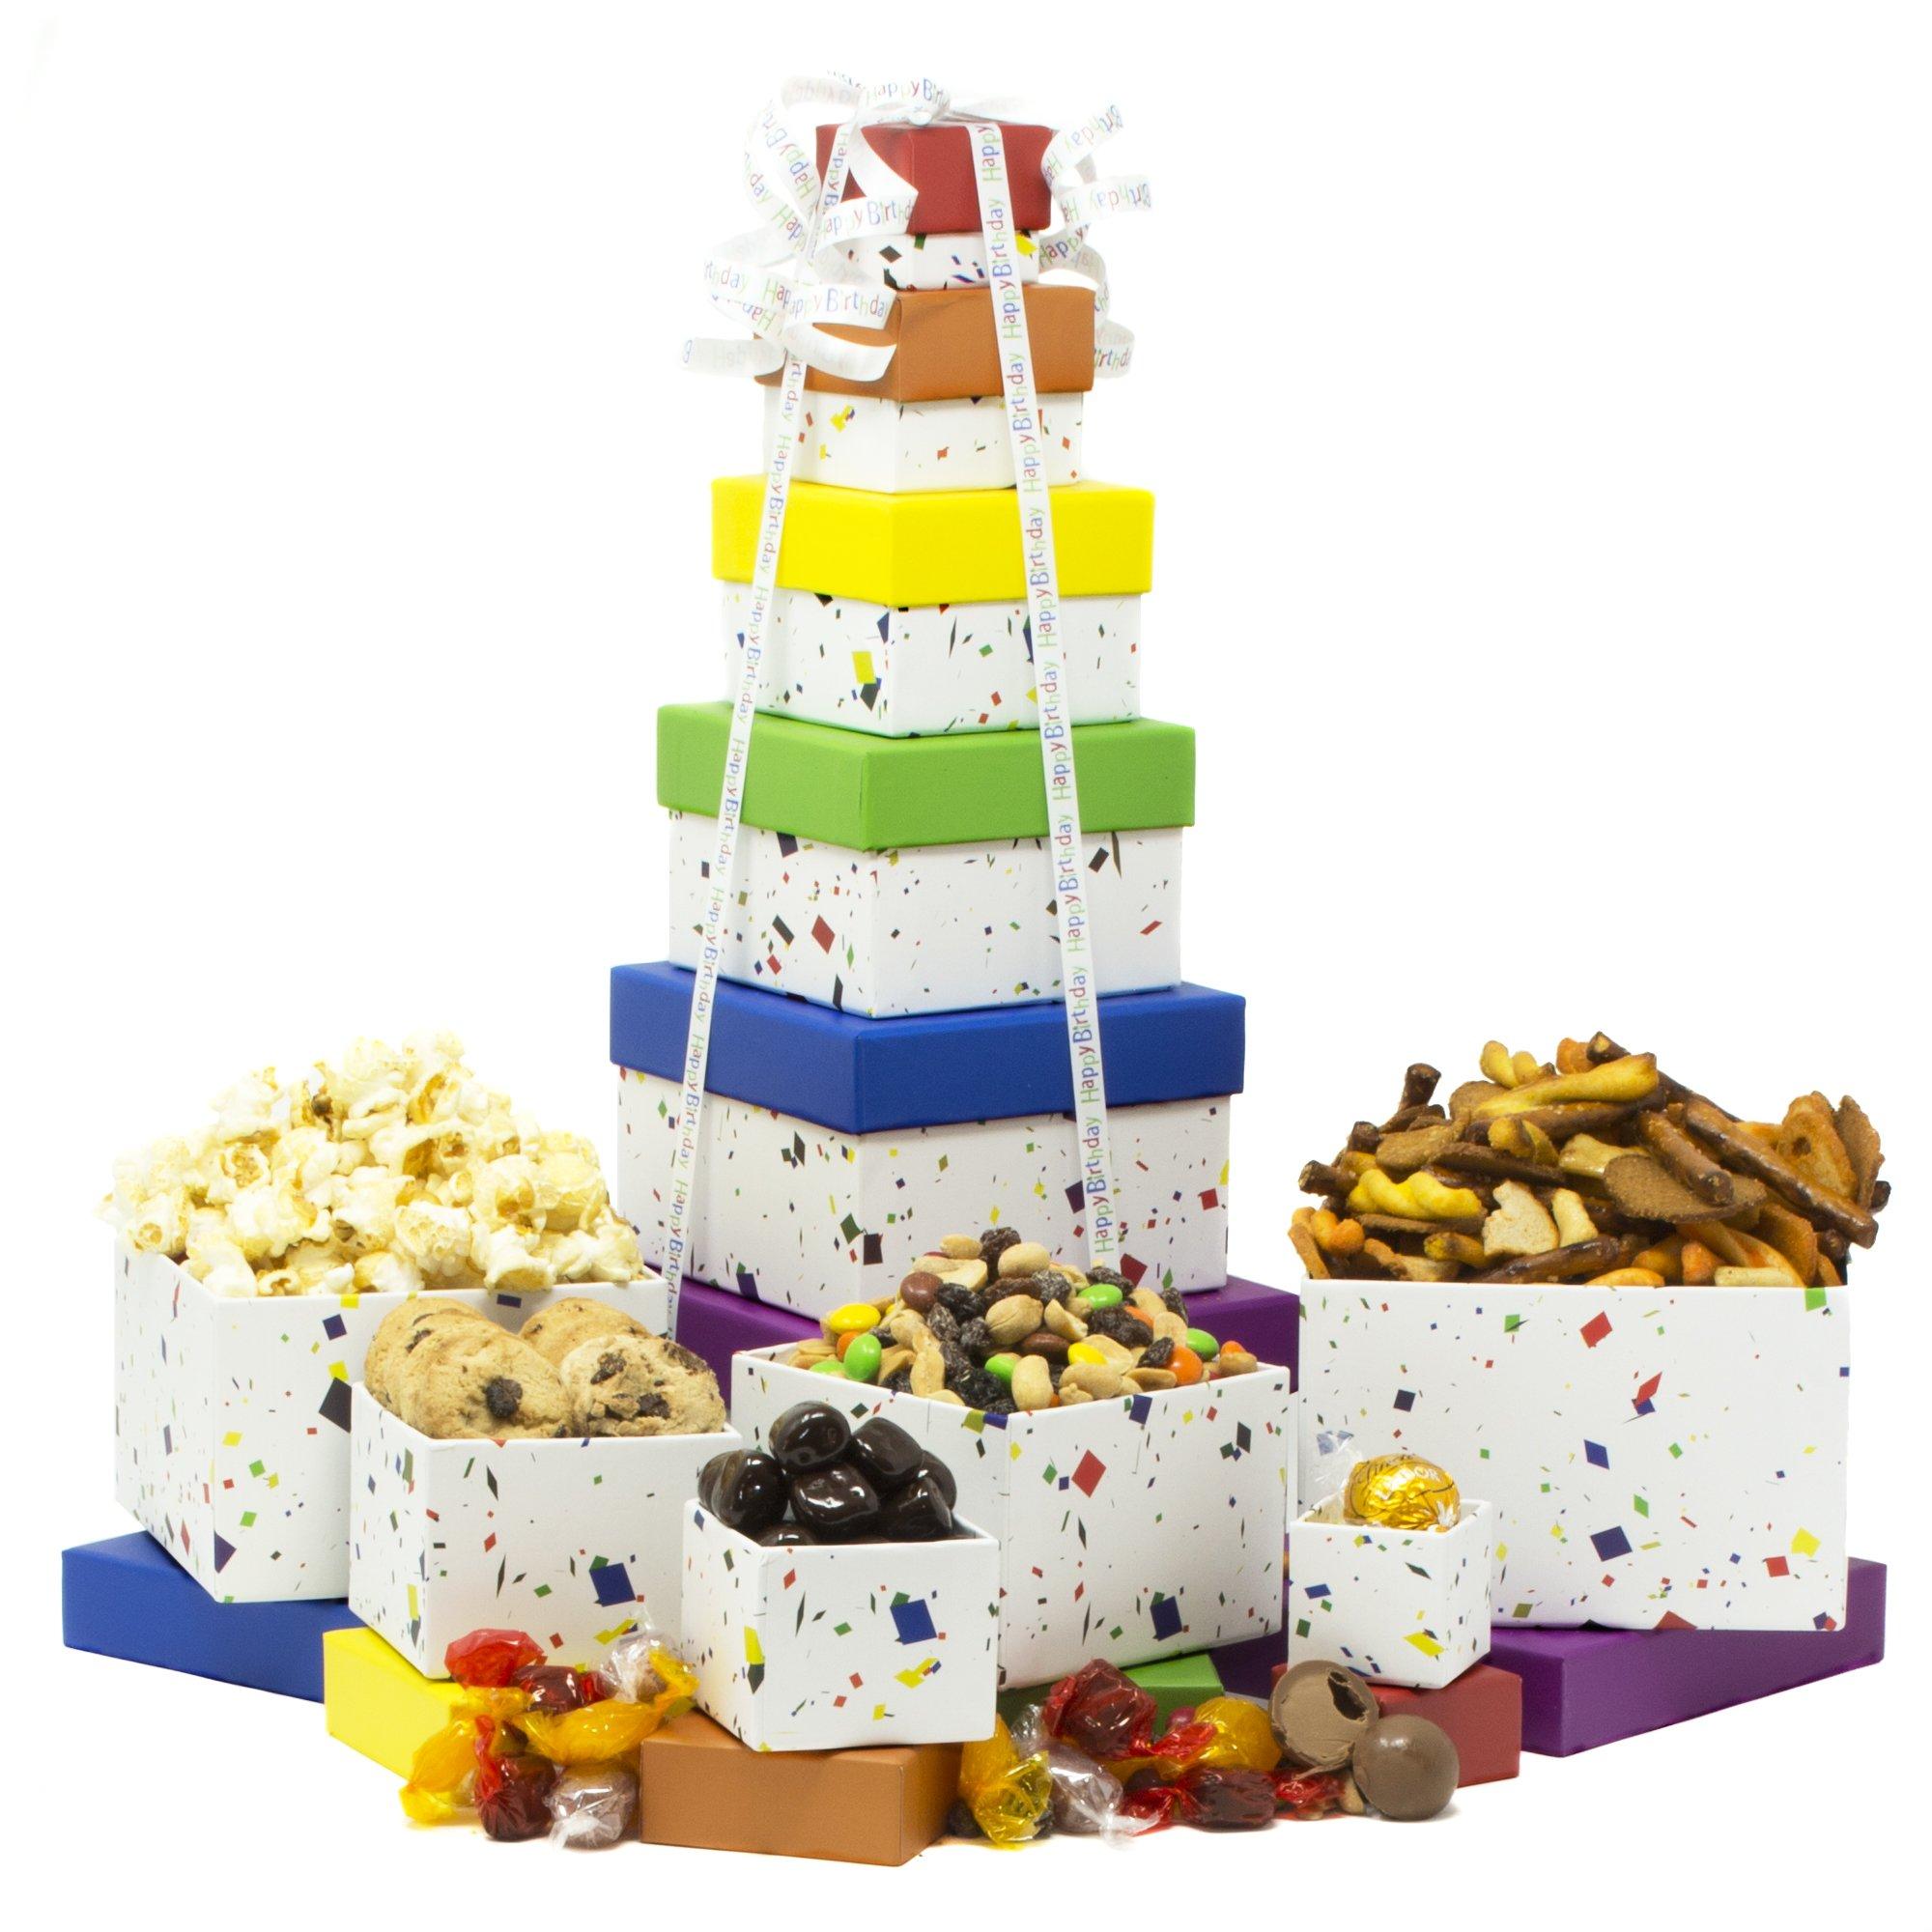 Happy Birthday Gift Tower By Gourmetgiftbaskets Com: Amazon.com: Adorable Happy Birthday Teddy Bear With Cake